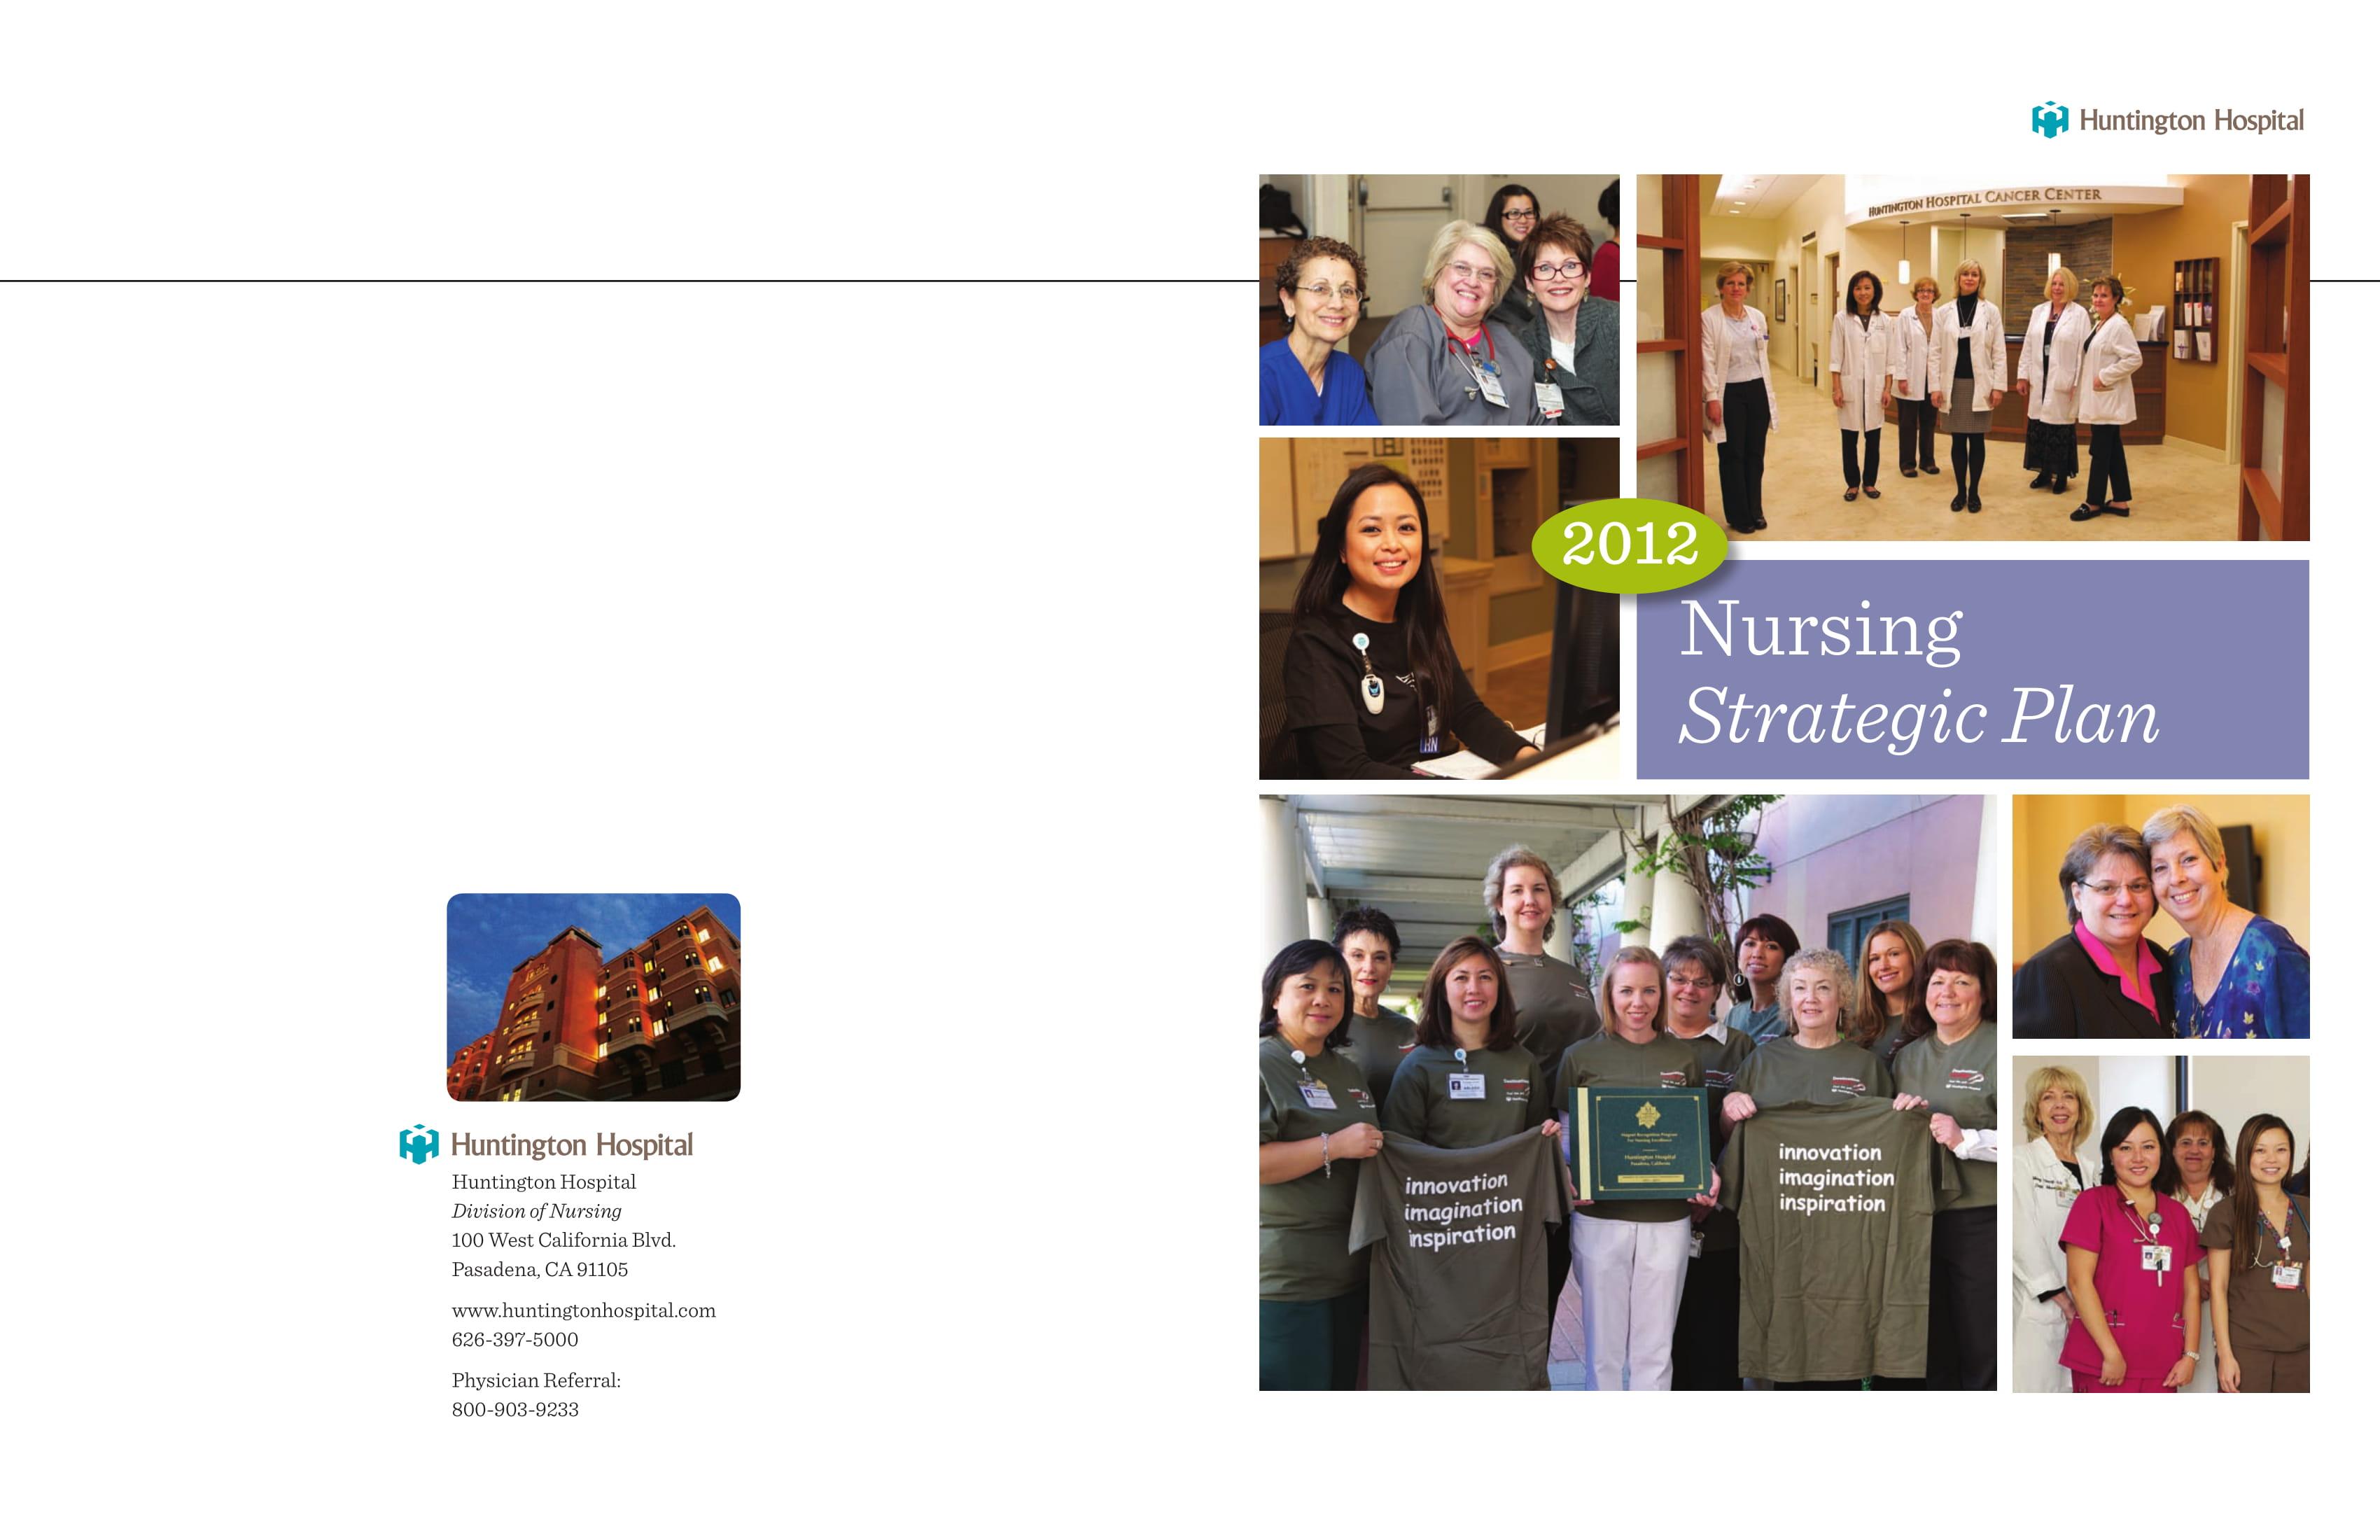 basic nursing strategic plan example 1